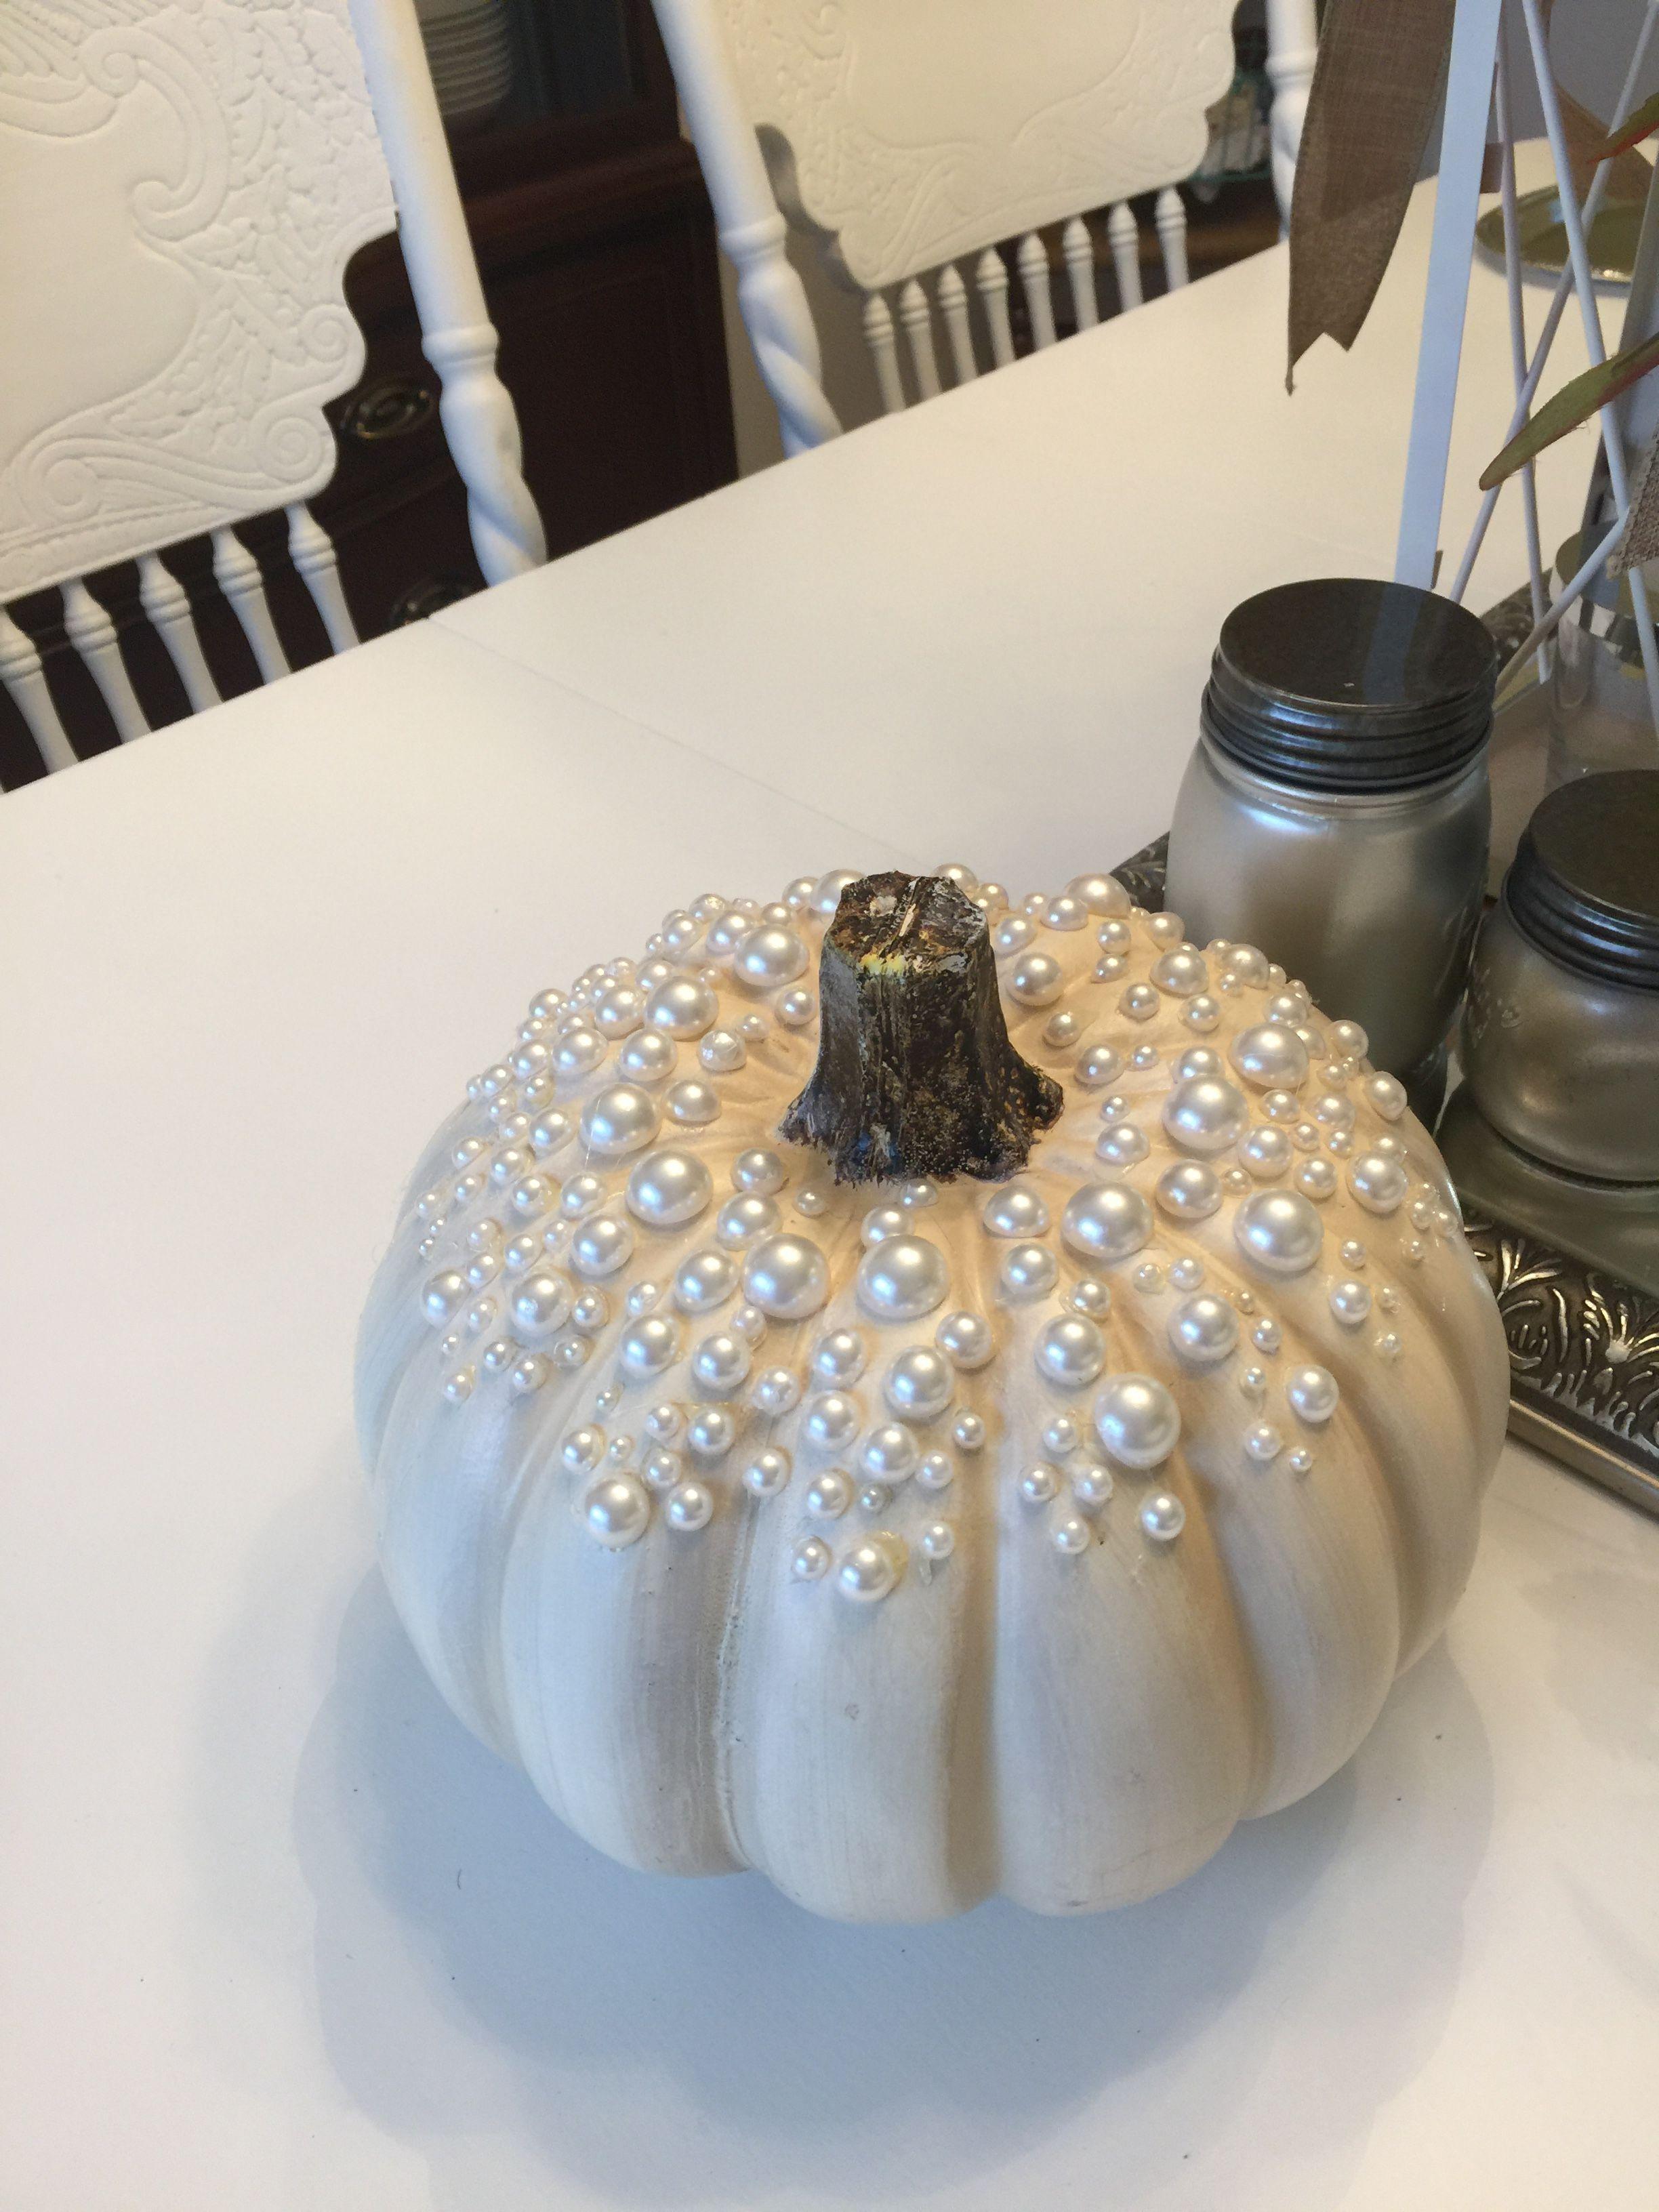 37 Gorgeous Pumpkin Decorating Ideas #pumpkinpaintingideasfall